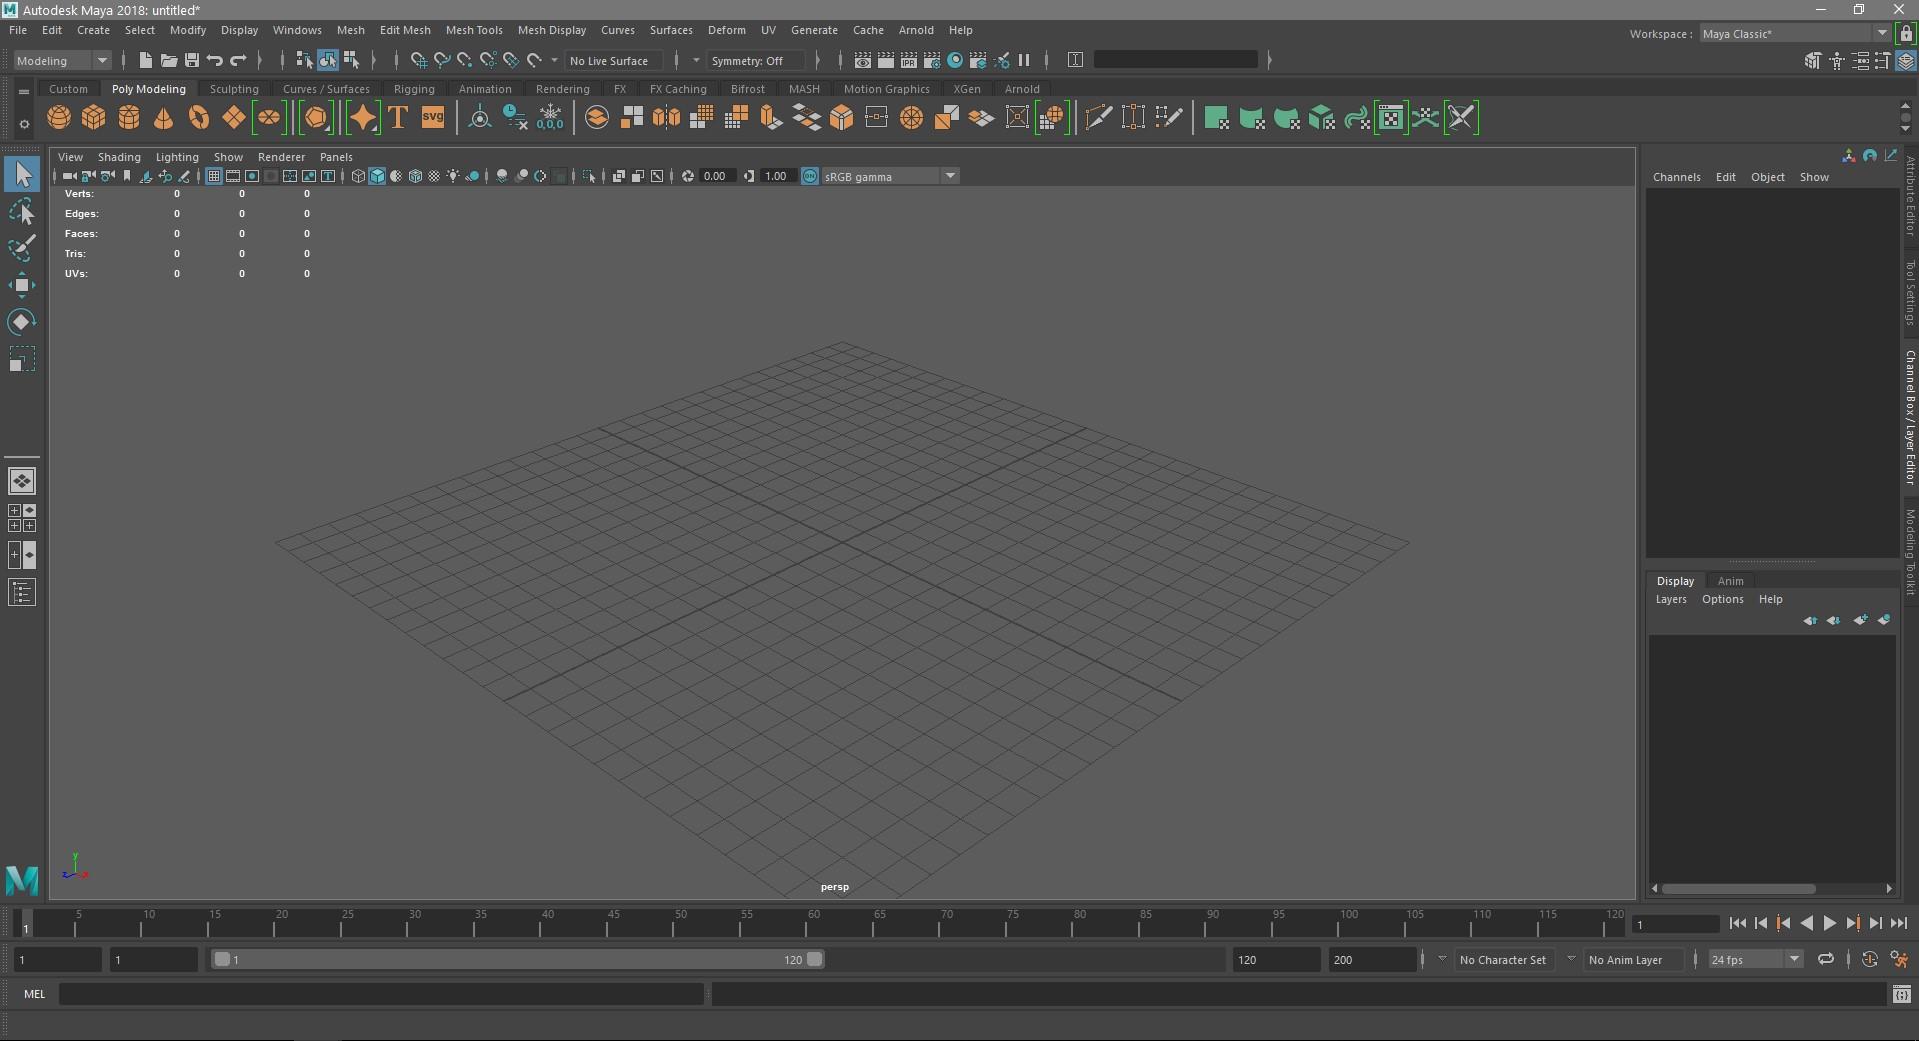 Design with Autodesk Maya 2018 win64 full license full license